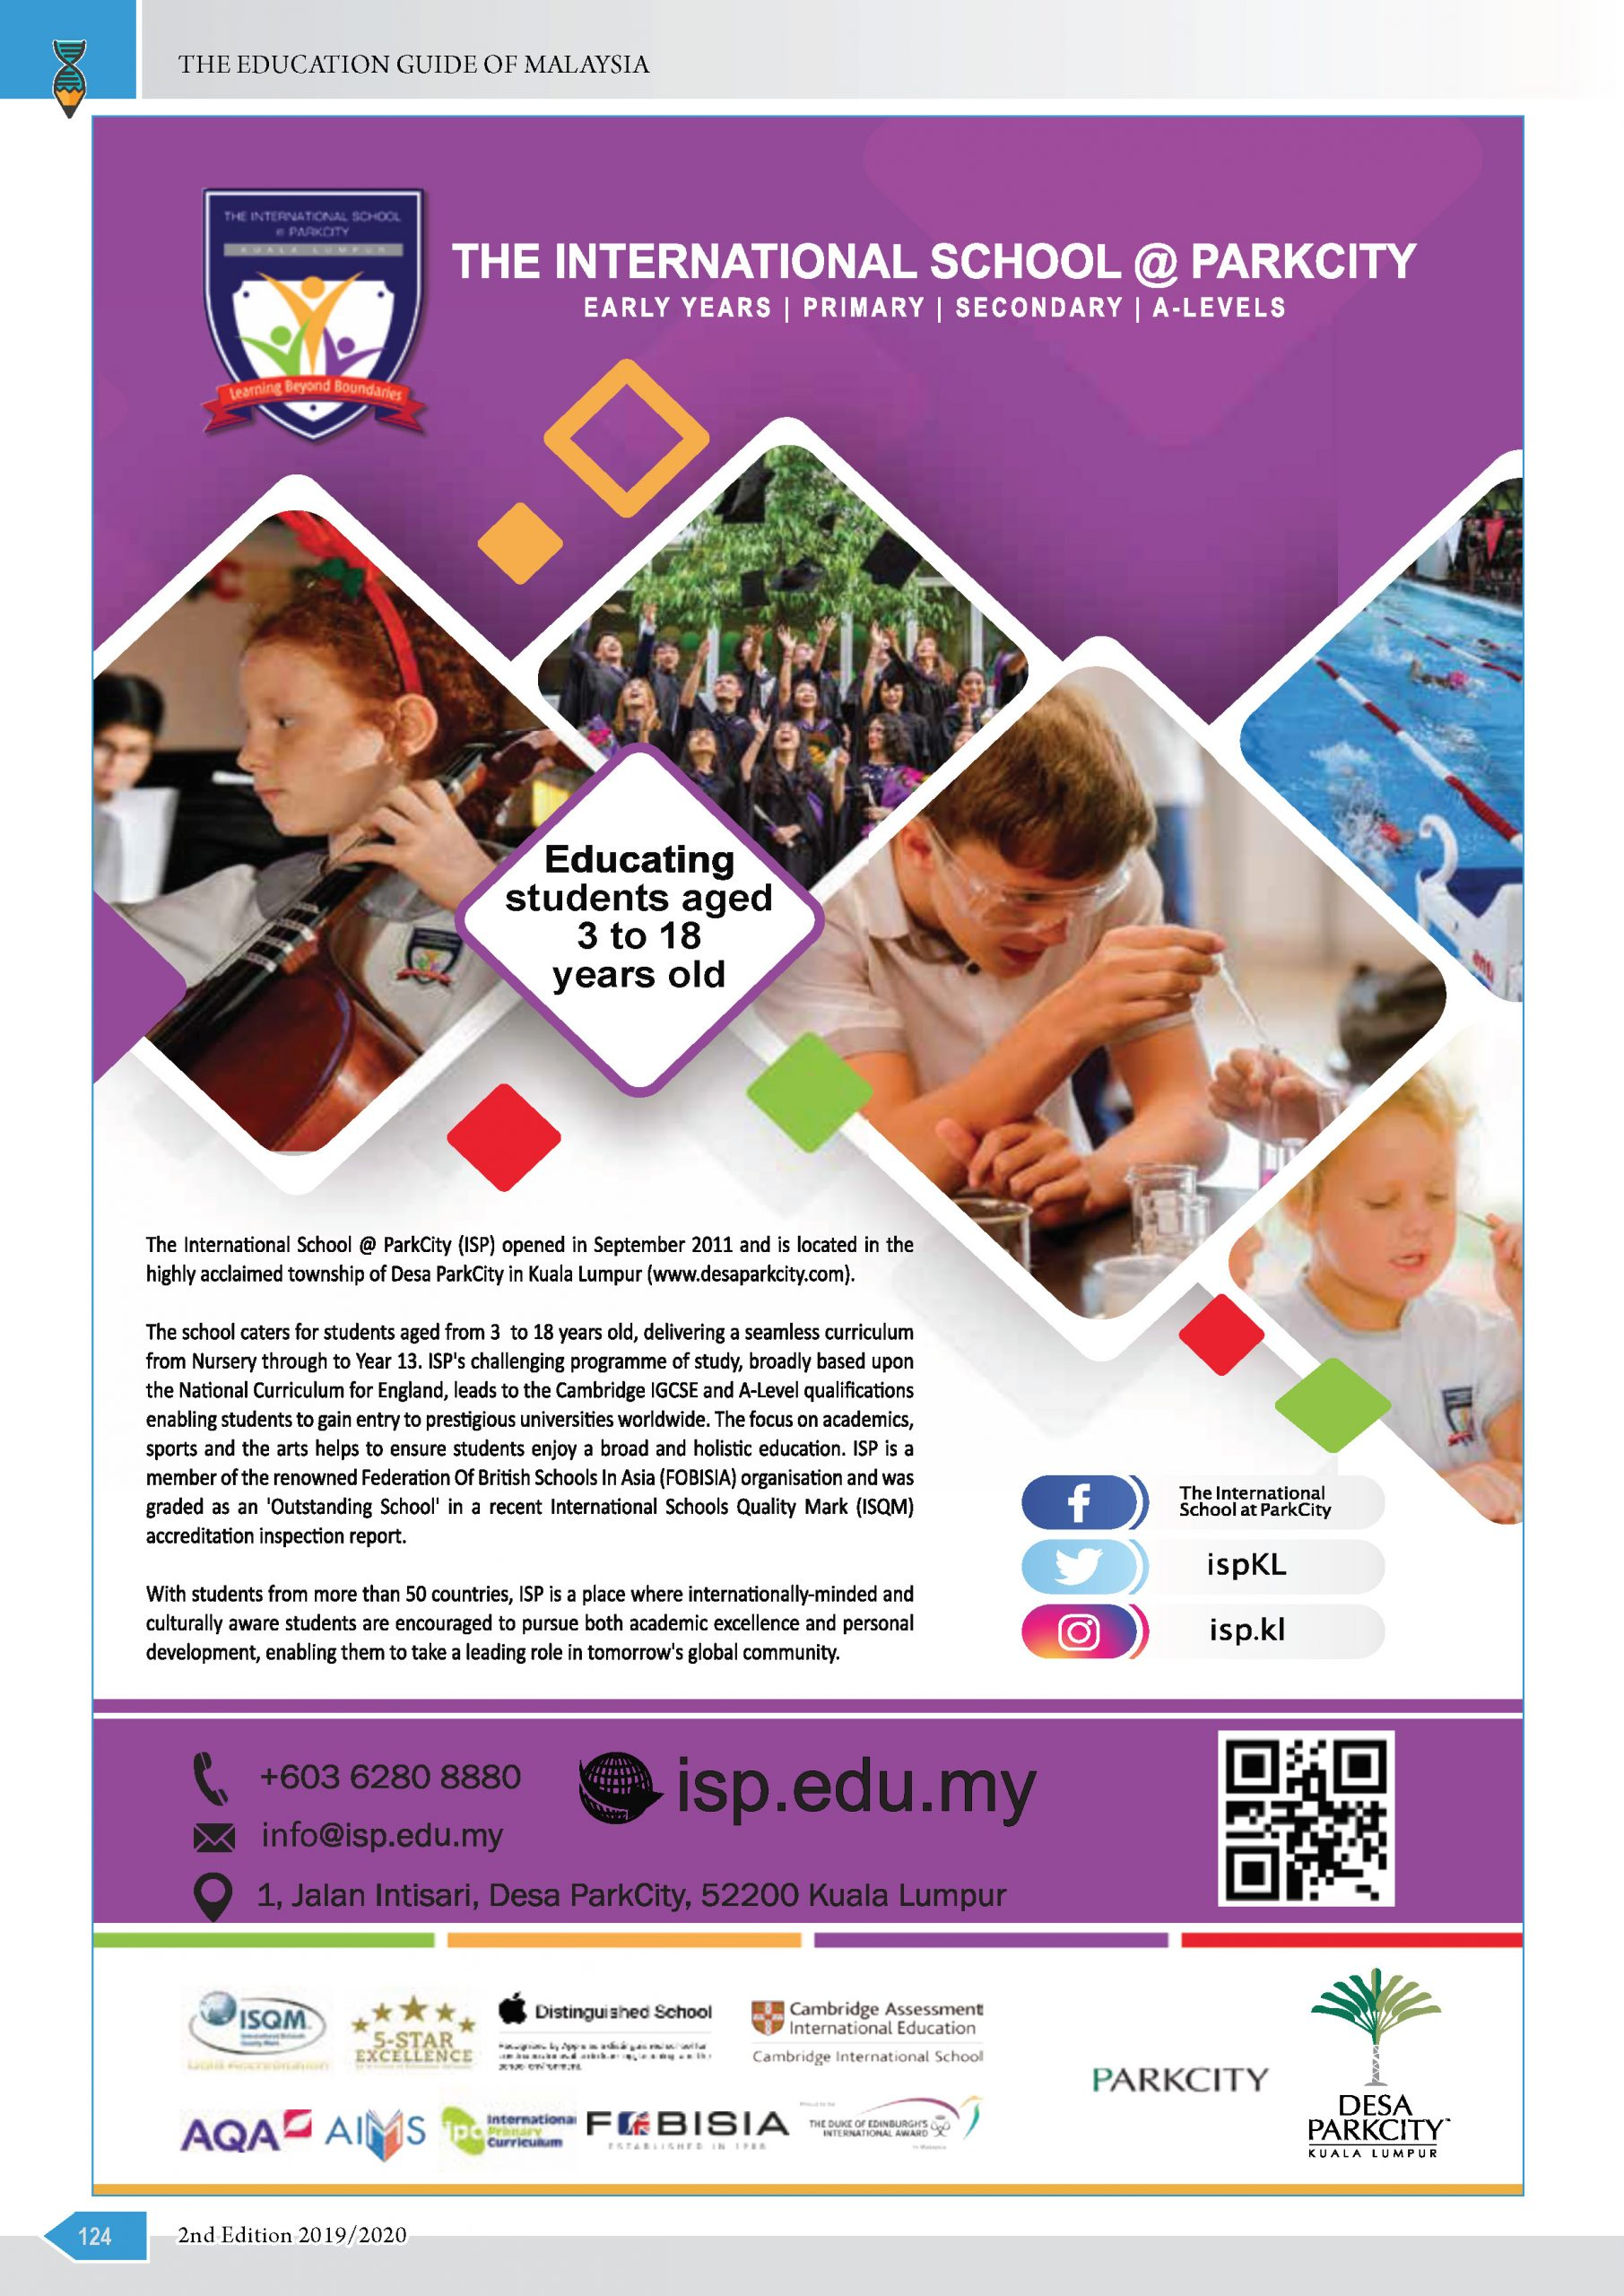 The International School At Parkcity